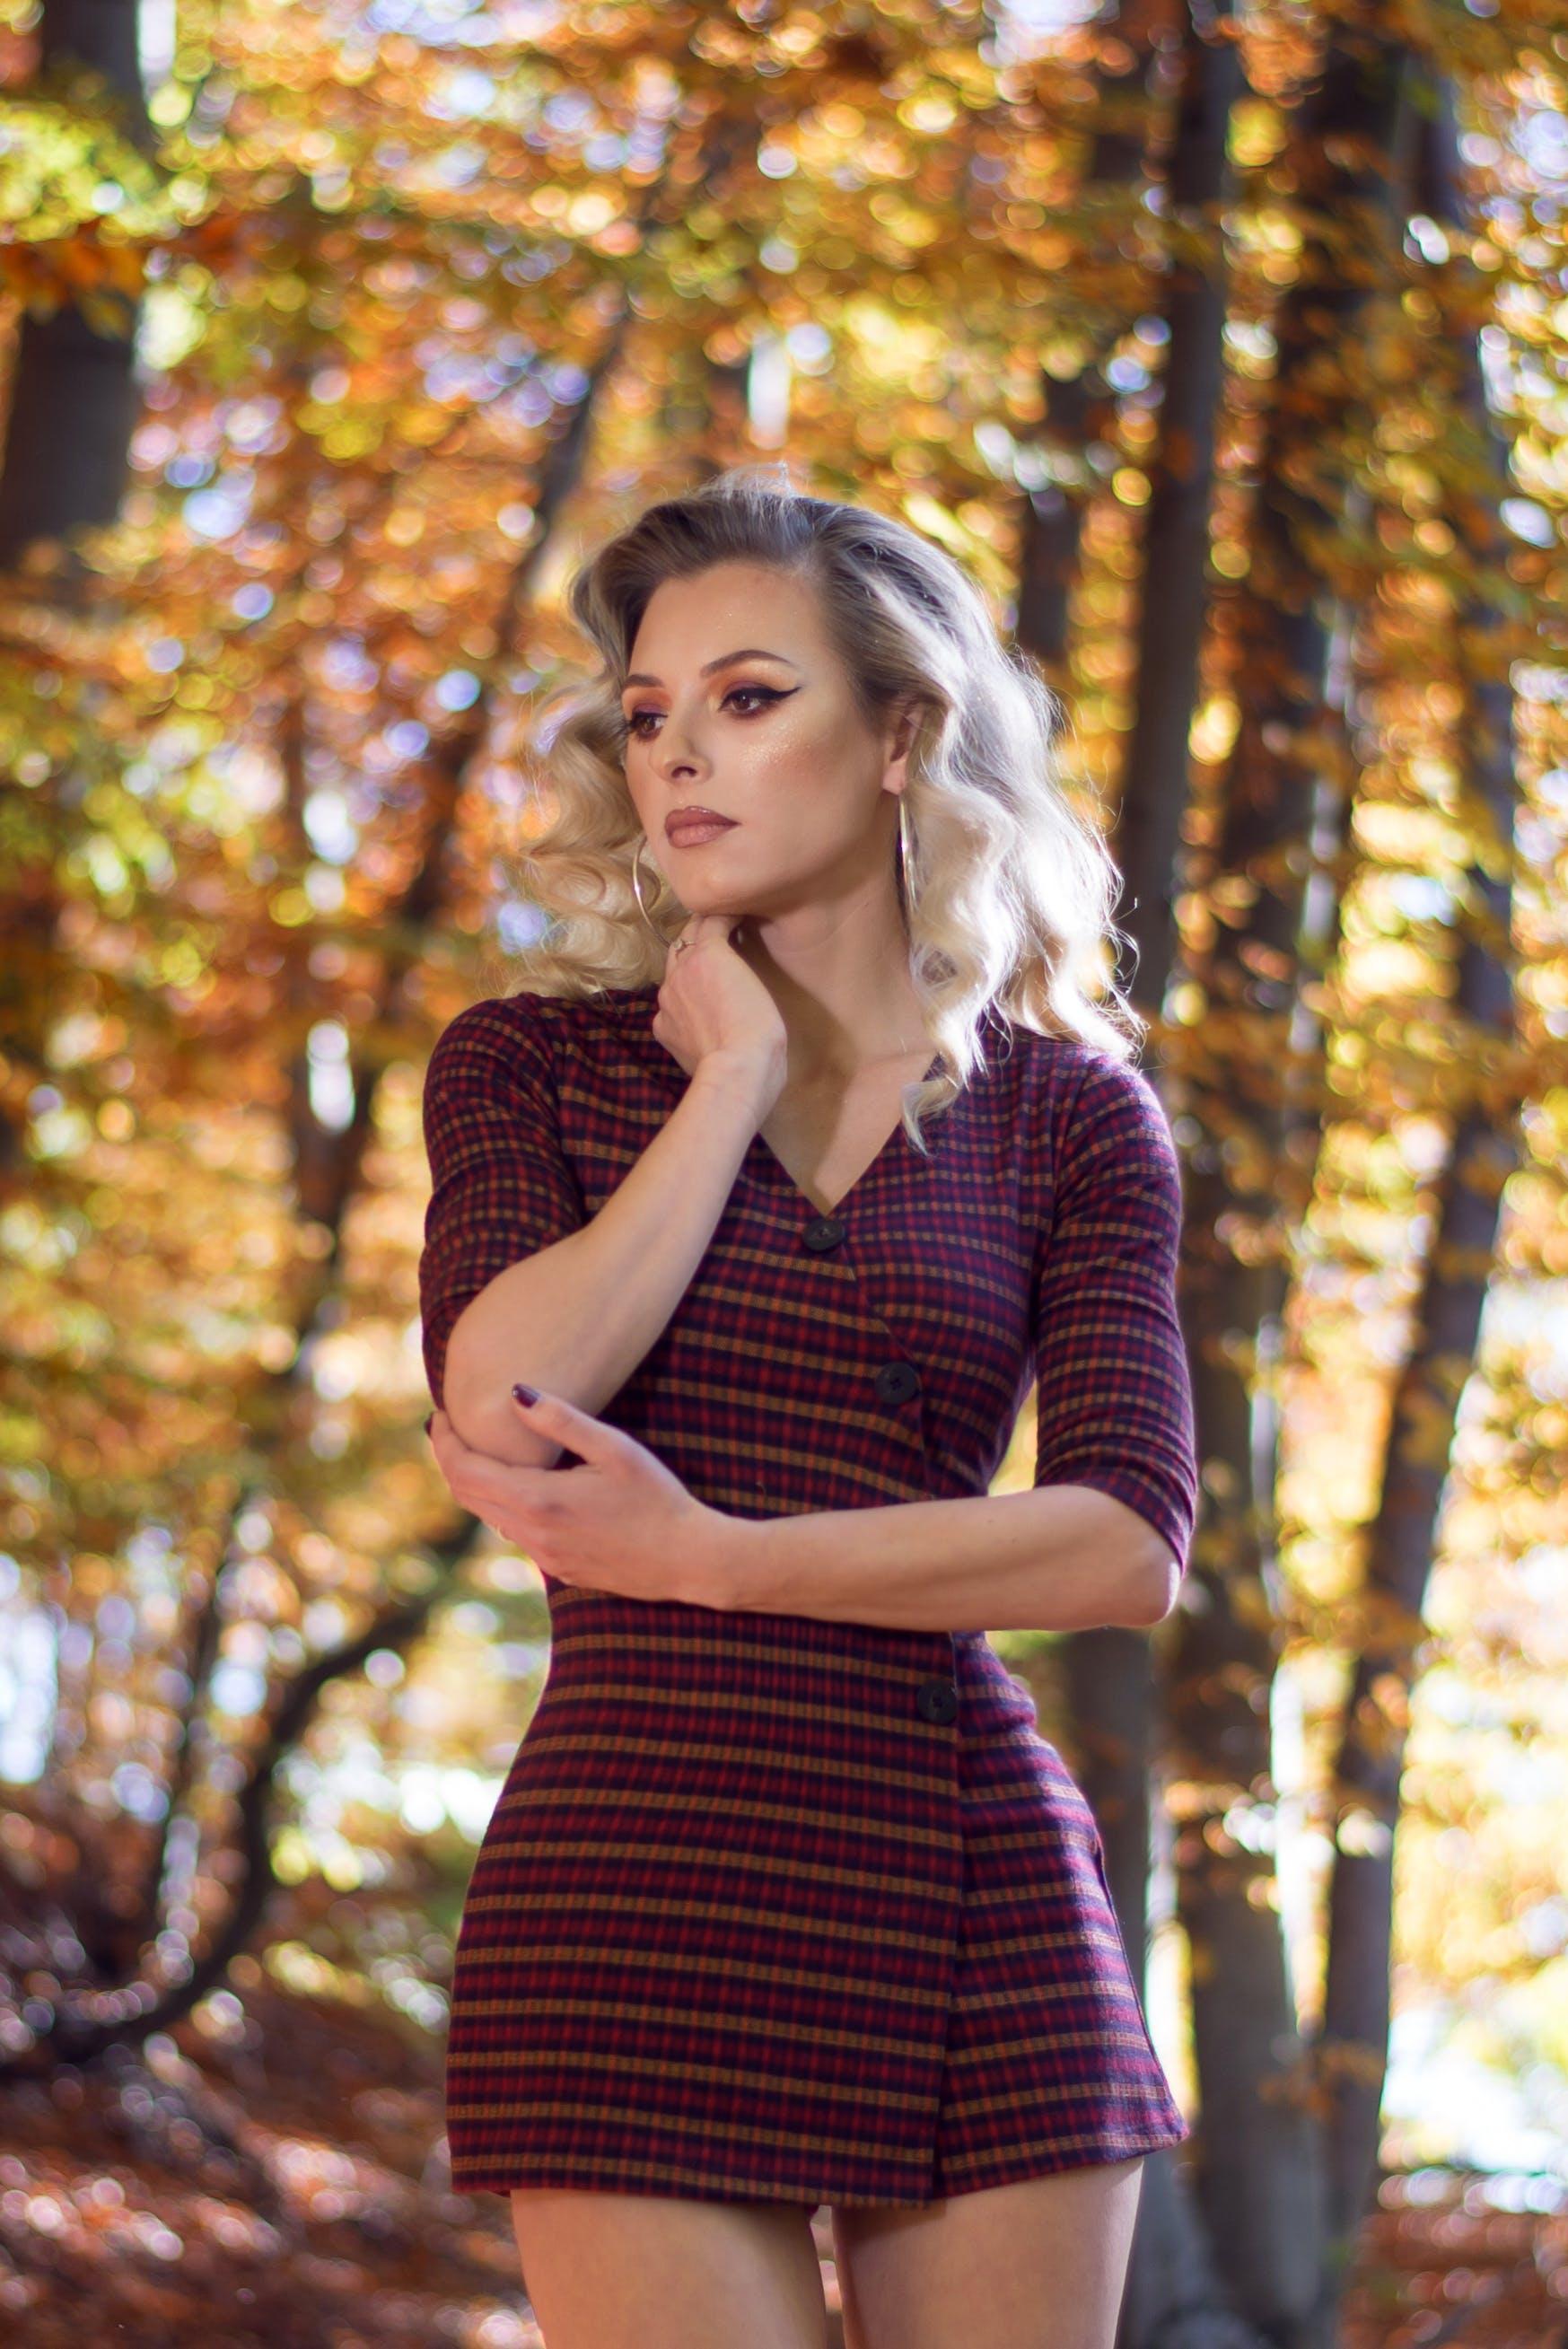 Free stock photo of girl, cute, autumn, style